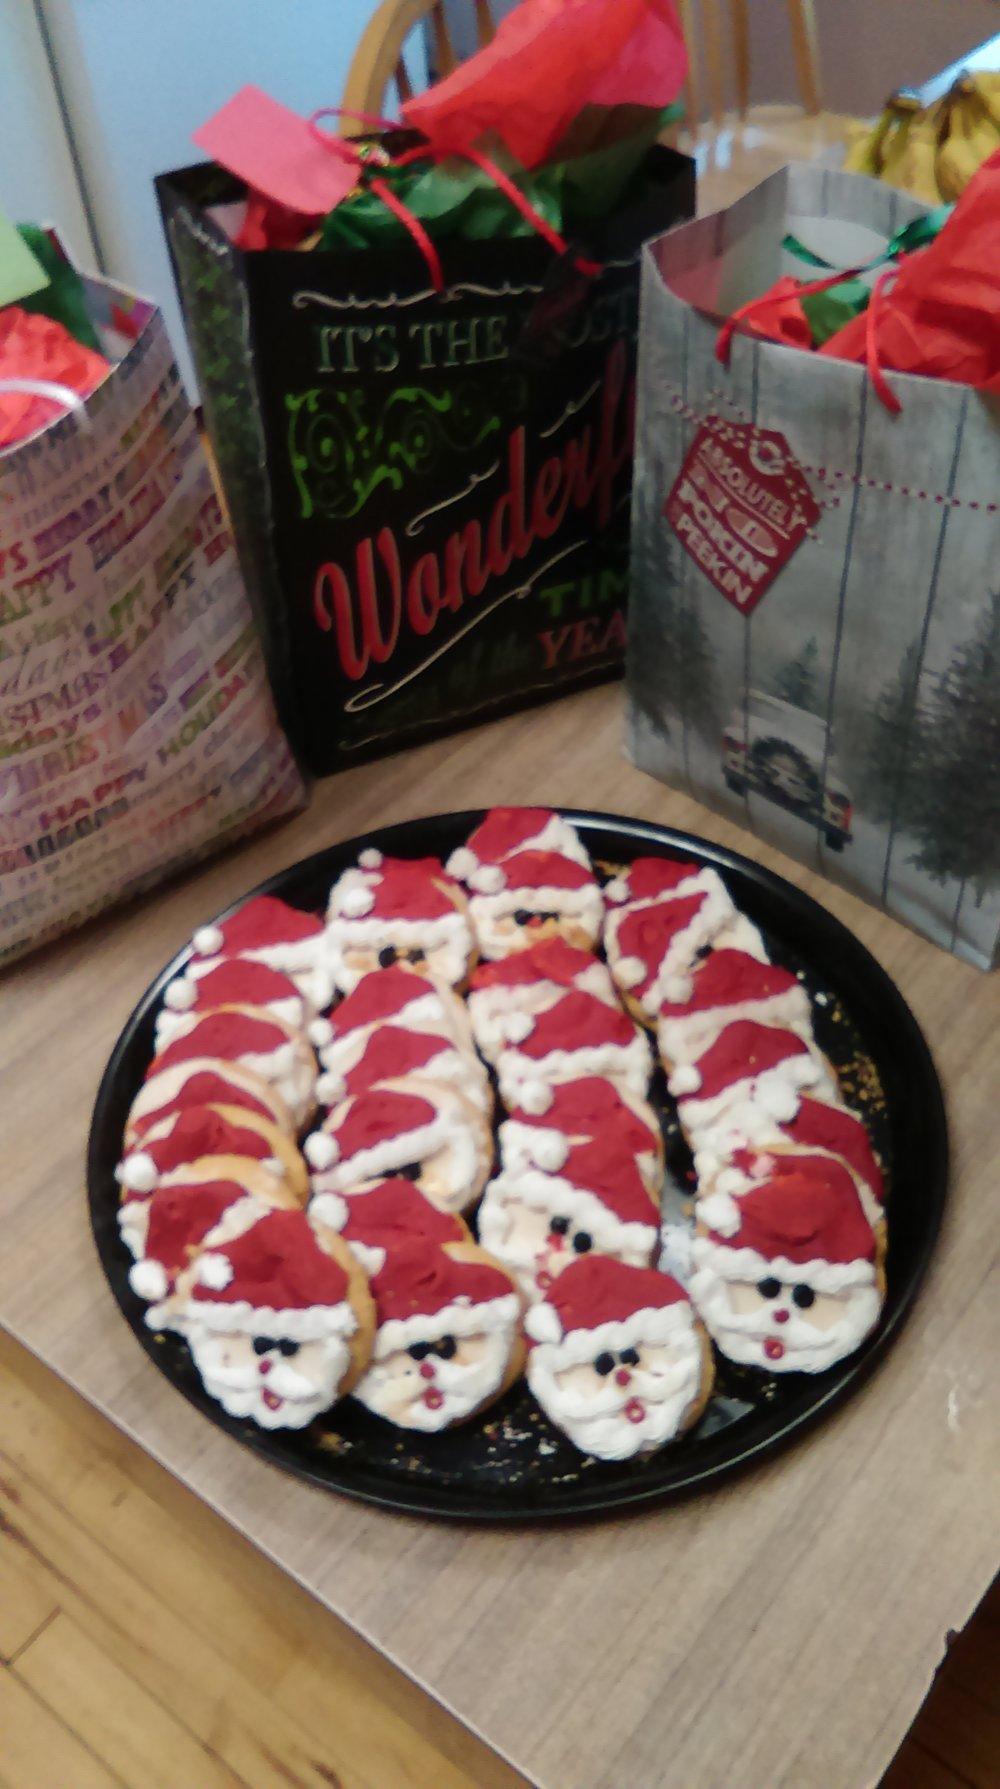 Christmas Cookies, Gifts, New Apostolic Ch to Janzen.jpg